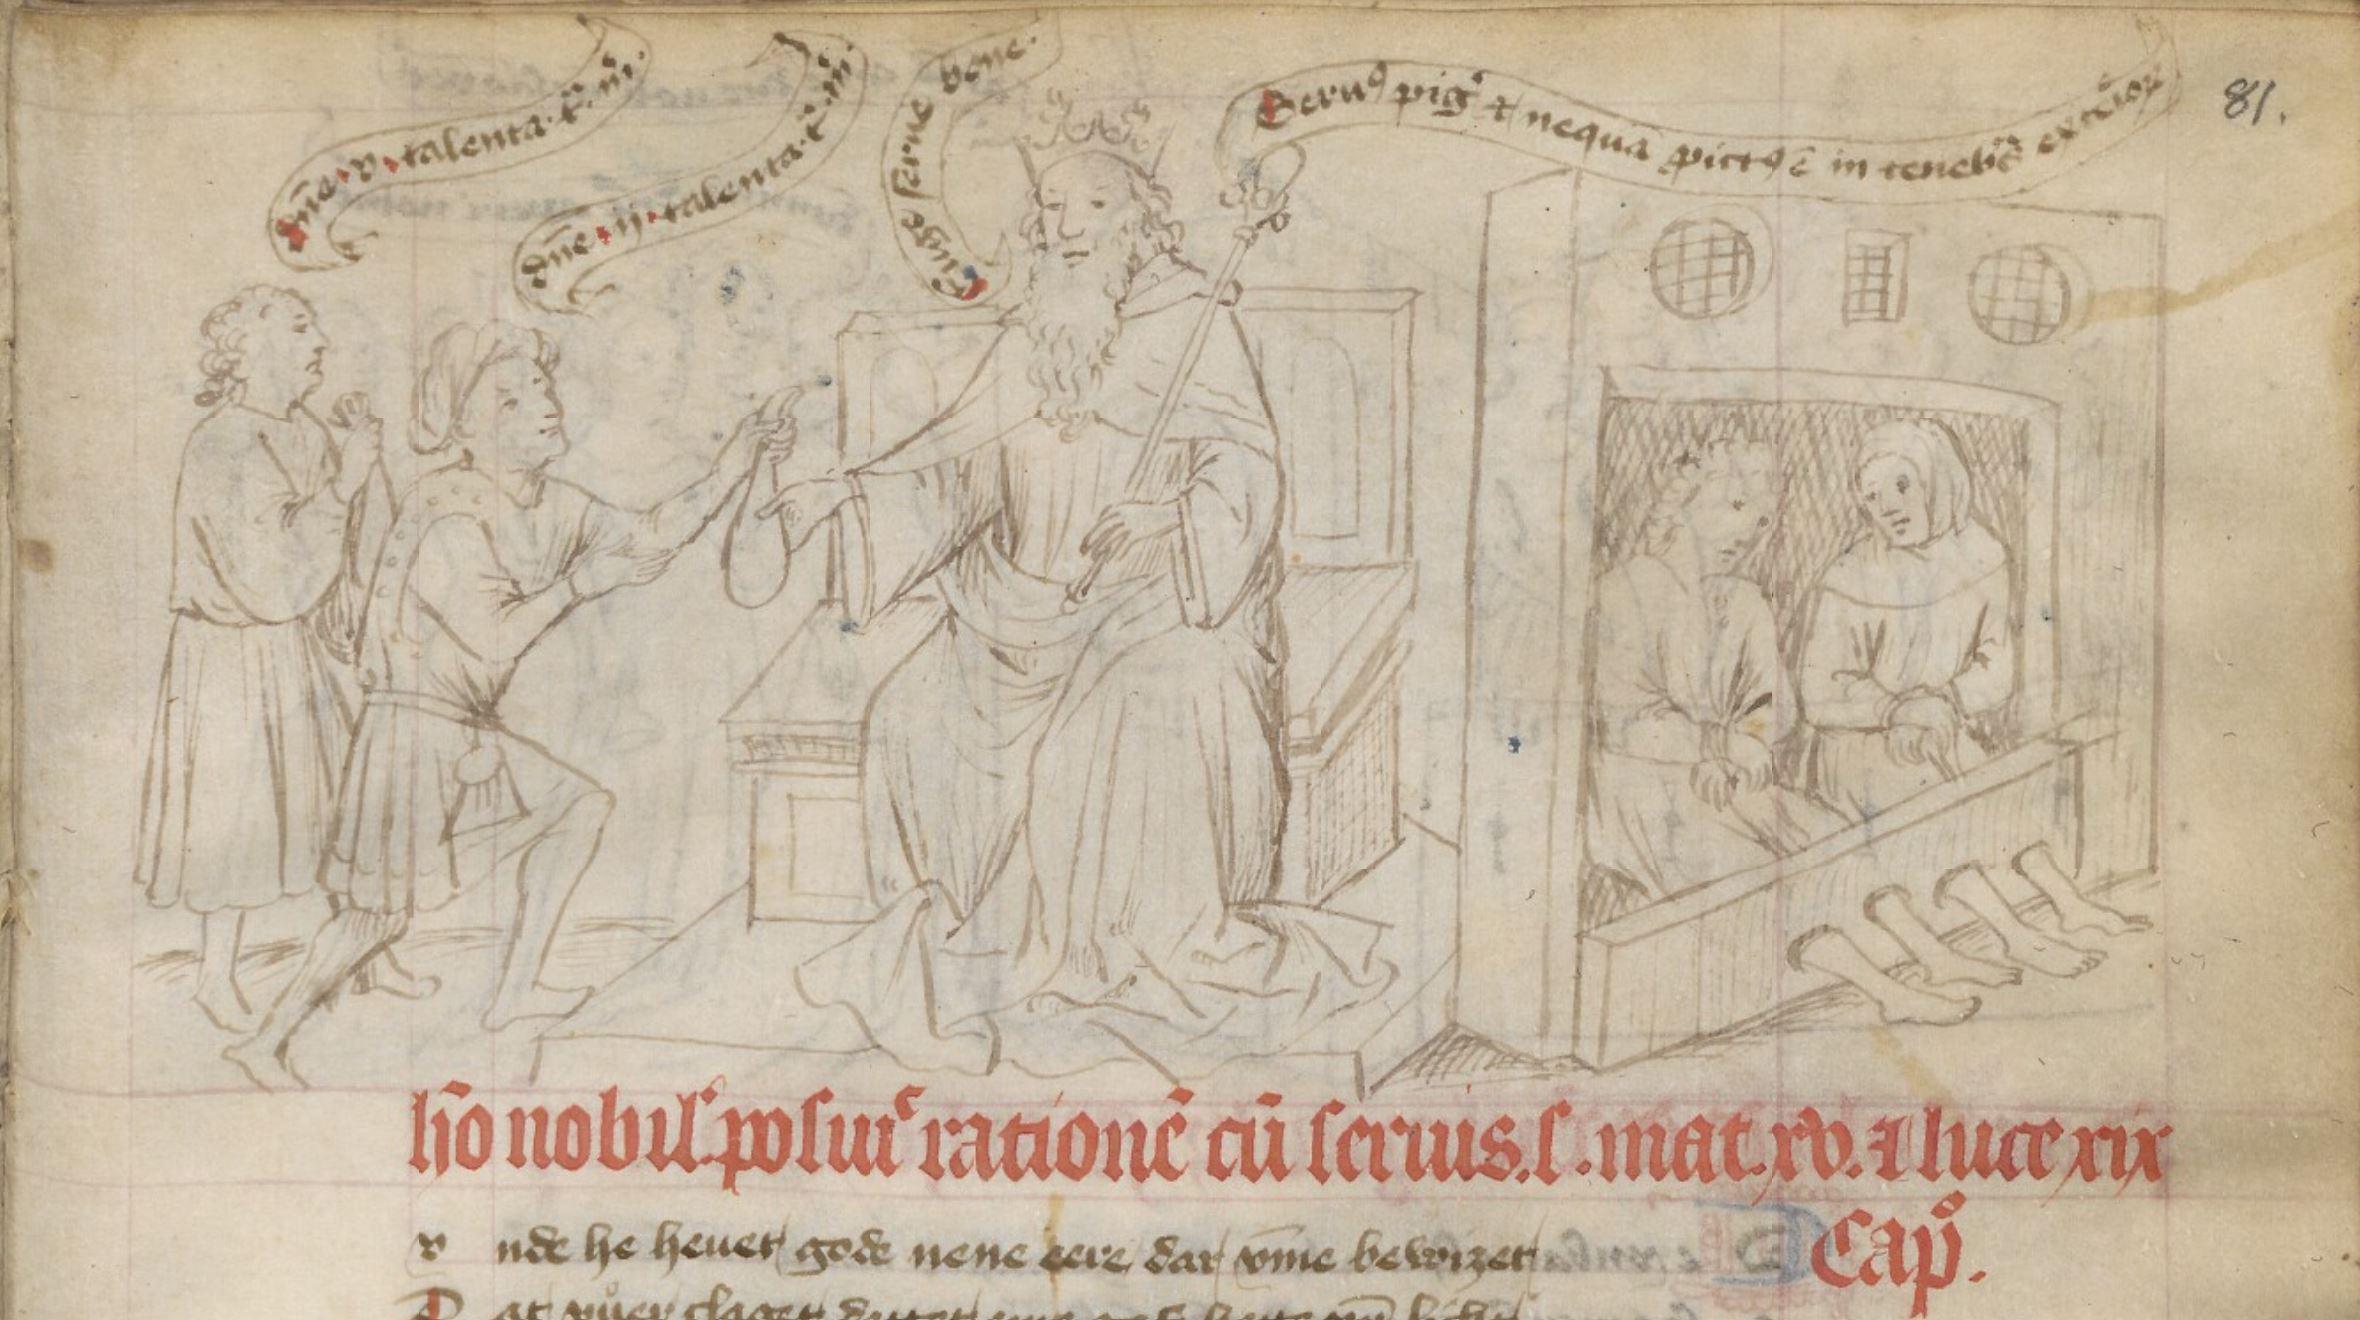 Speculum humanae salvationis, 1440 ca Copenhagen Kongelige Bibliotek GKS 79 fol. 81r